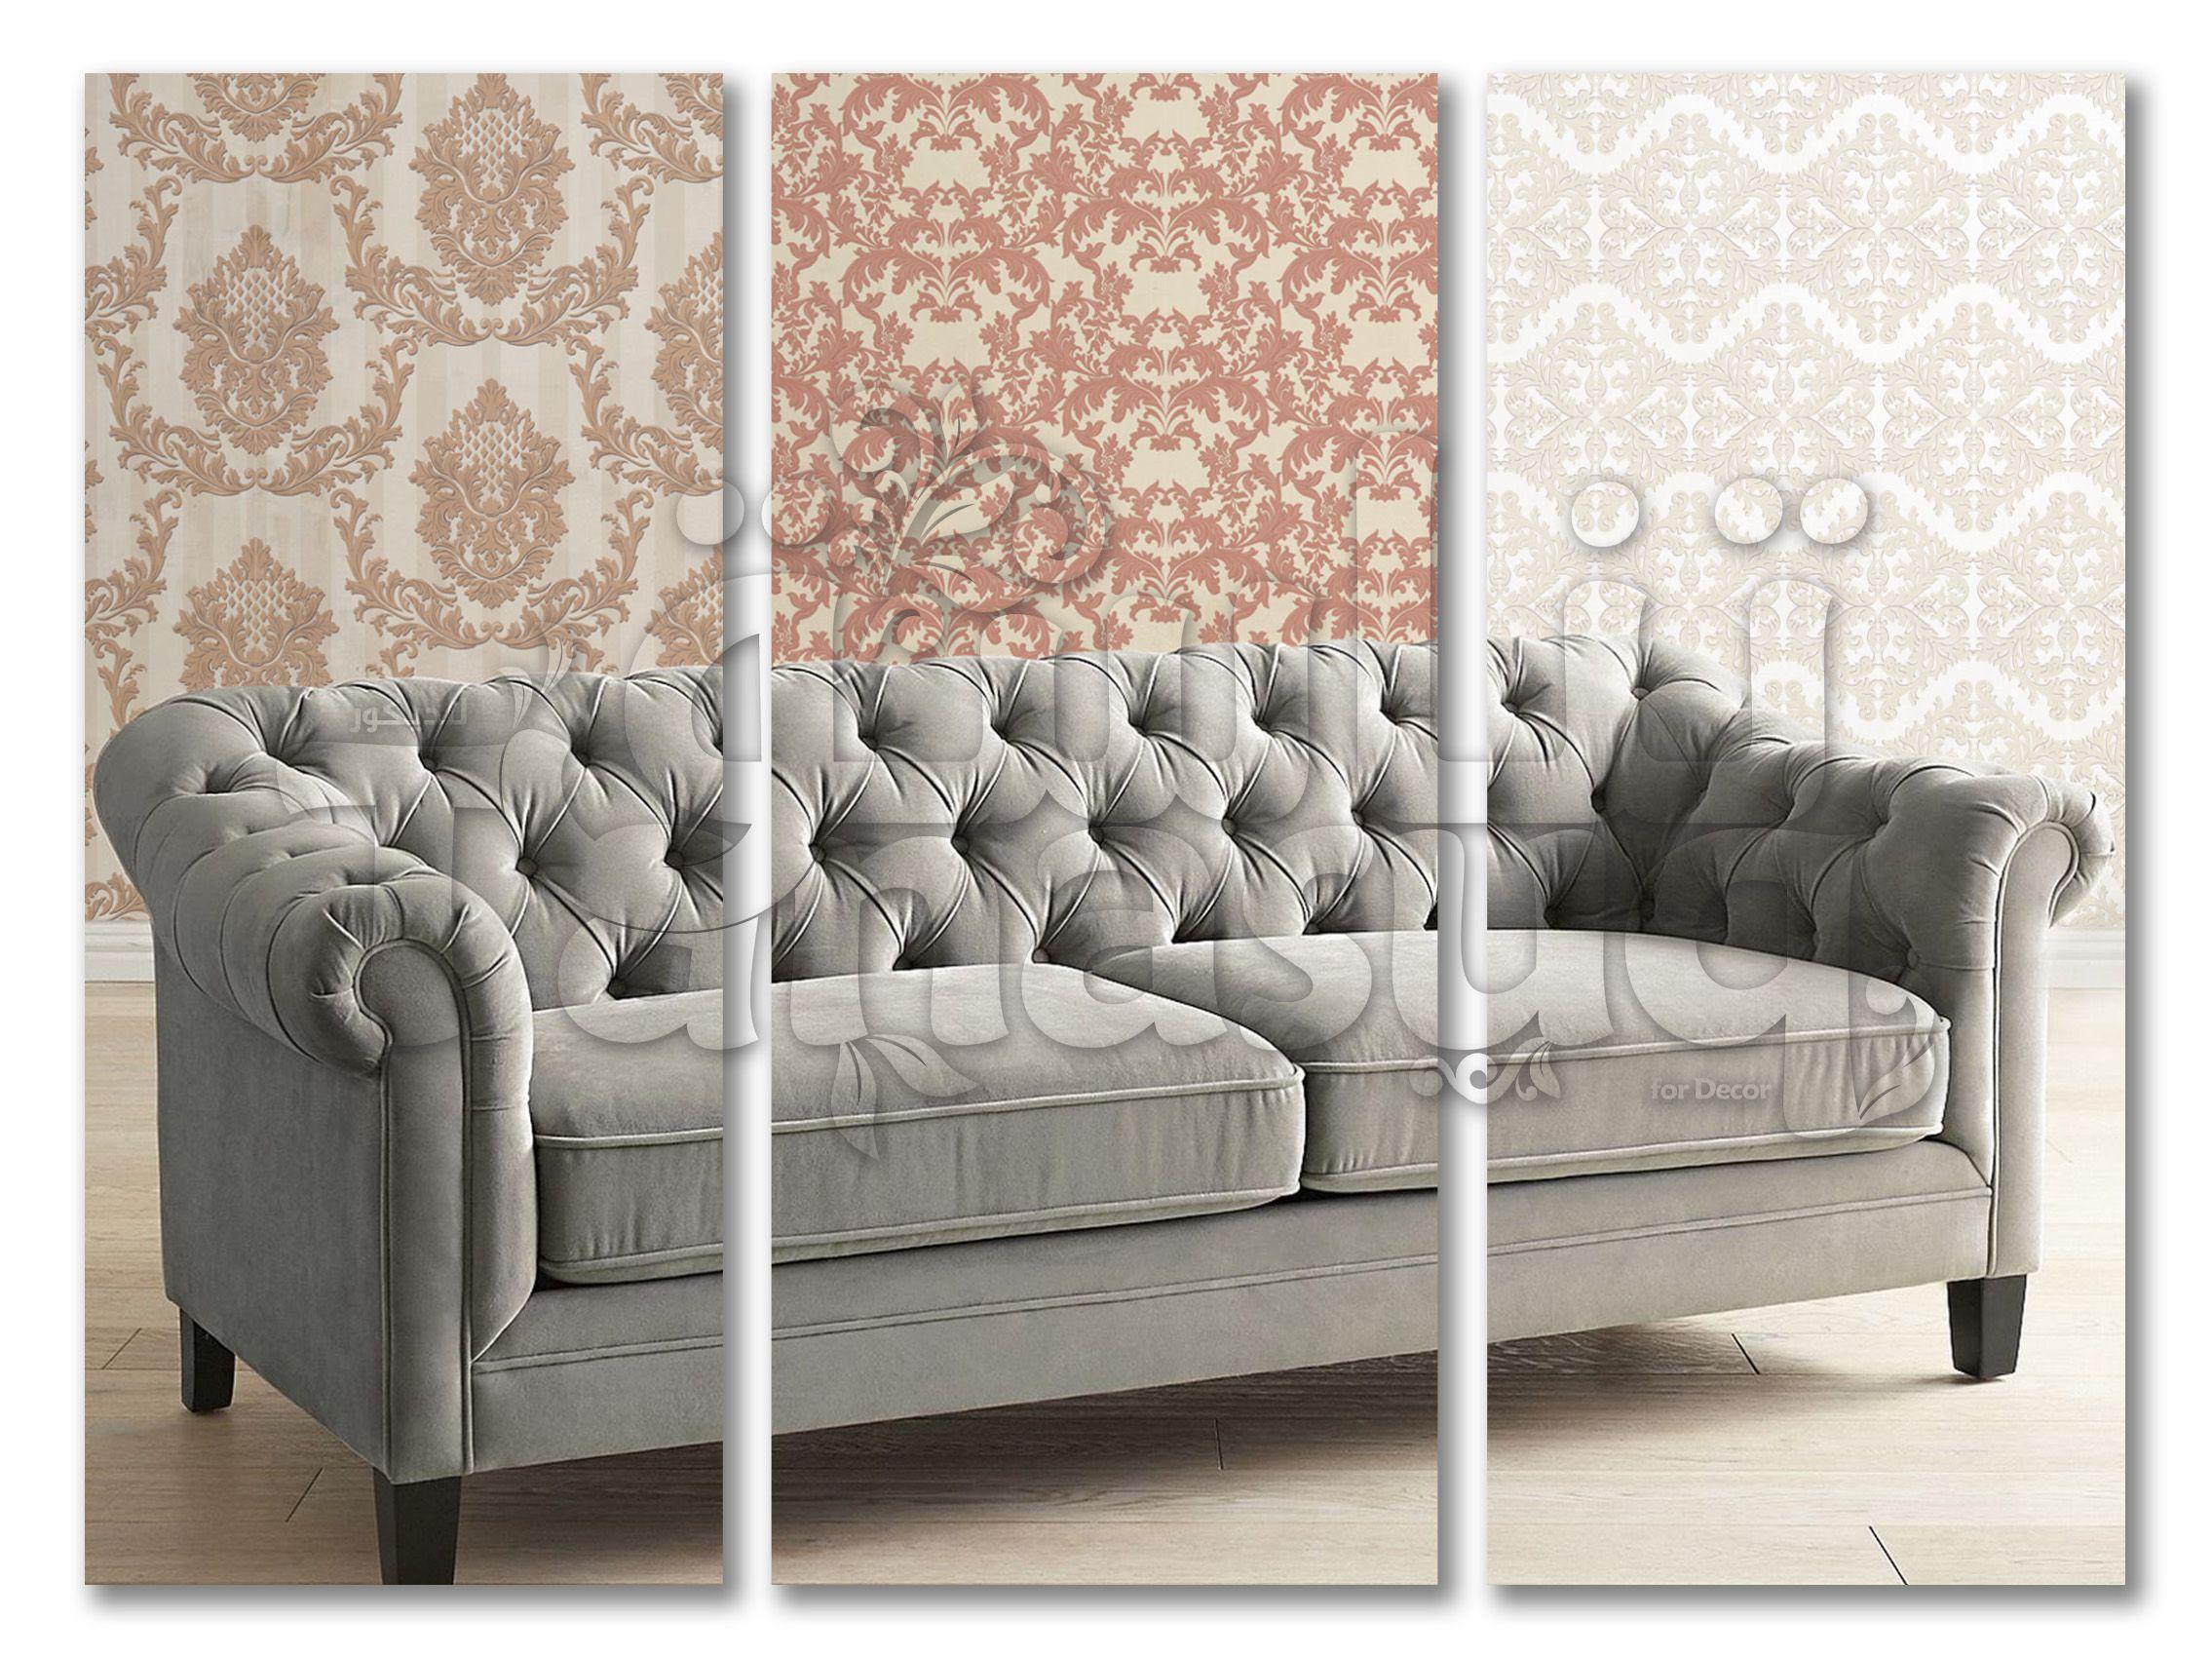 احدث ورق حائط ريسبشن Tanasuq اسعار ورق حائط شركة تناسق للديكور In 2021 Home Decor Decor Throw Blanket